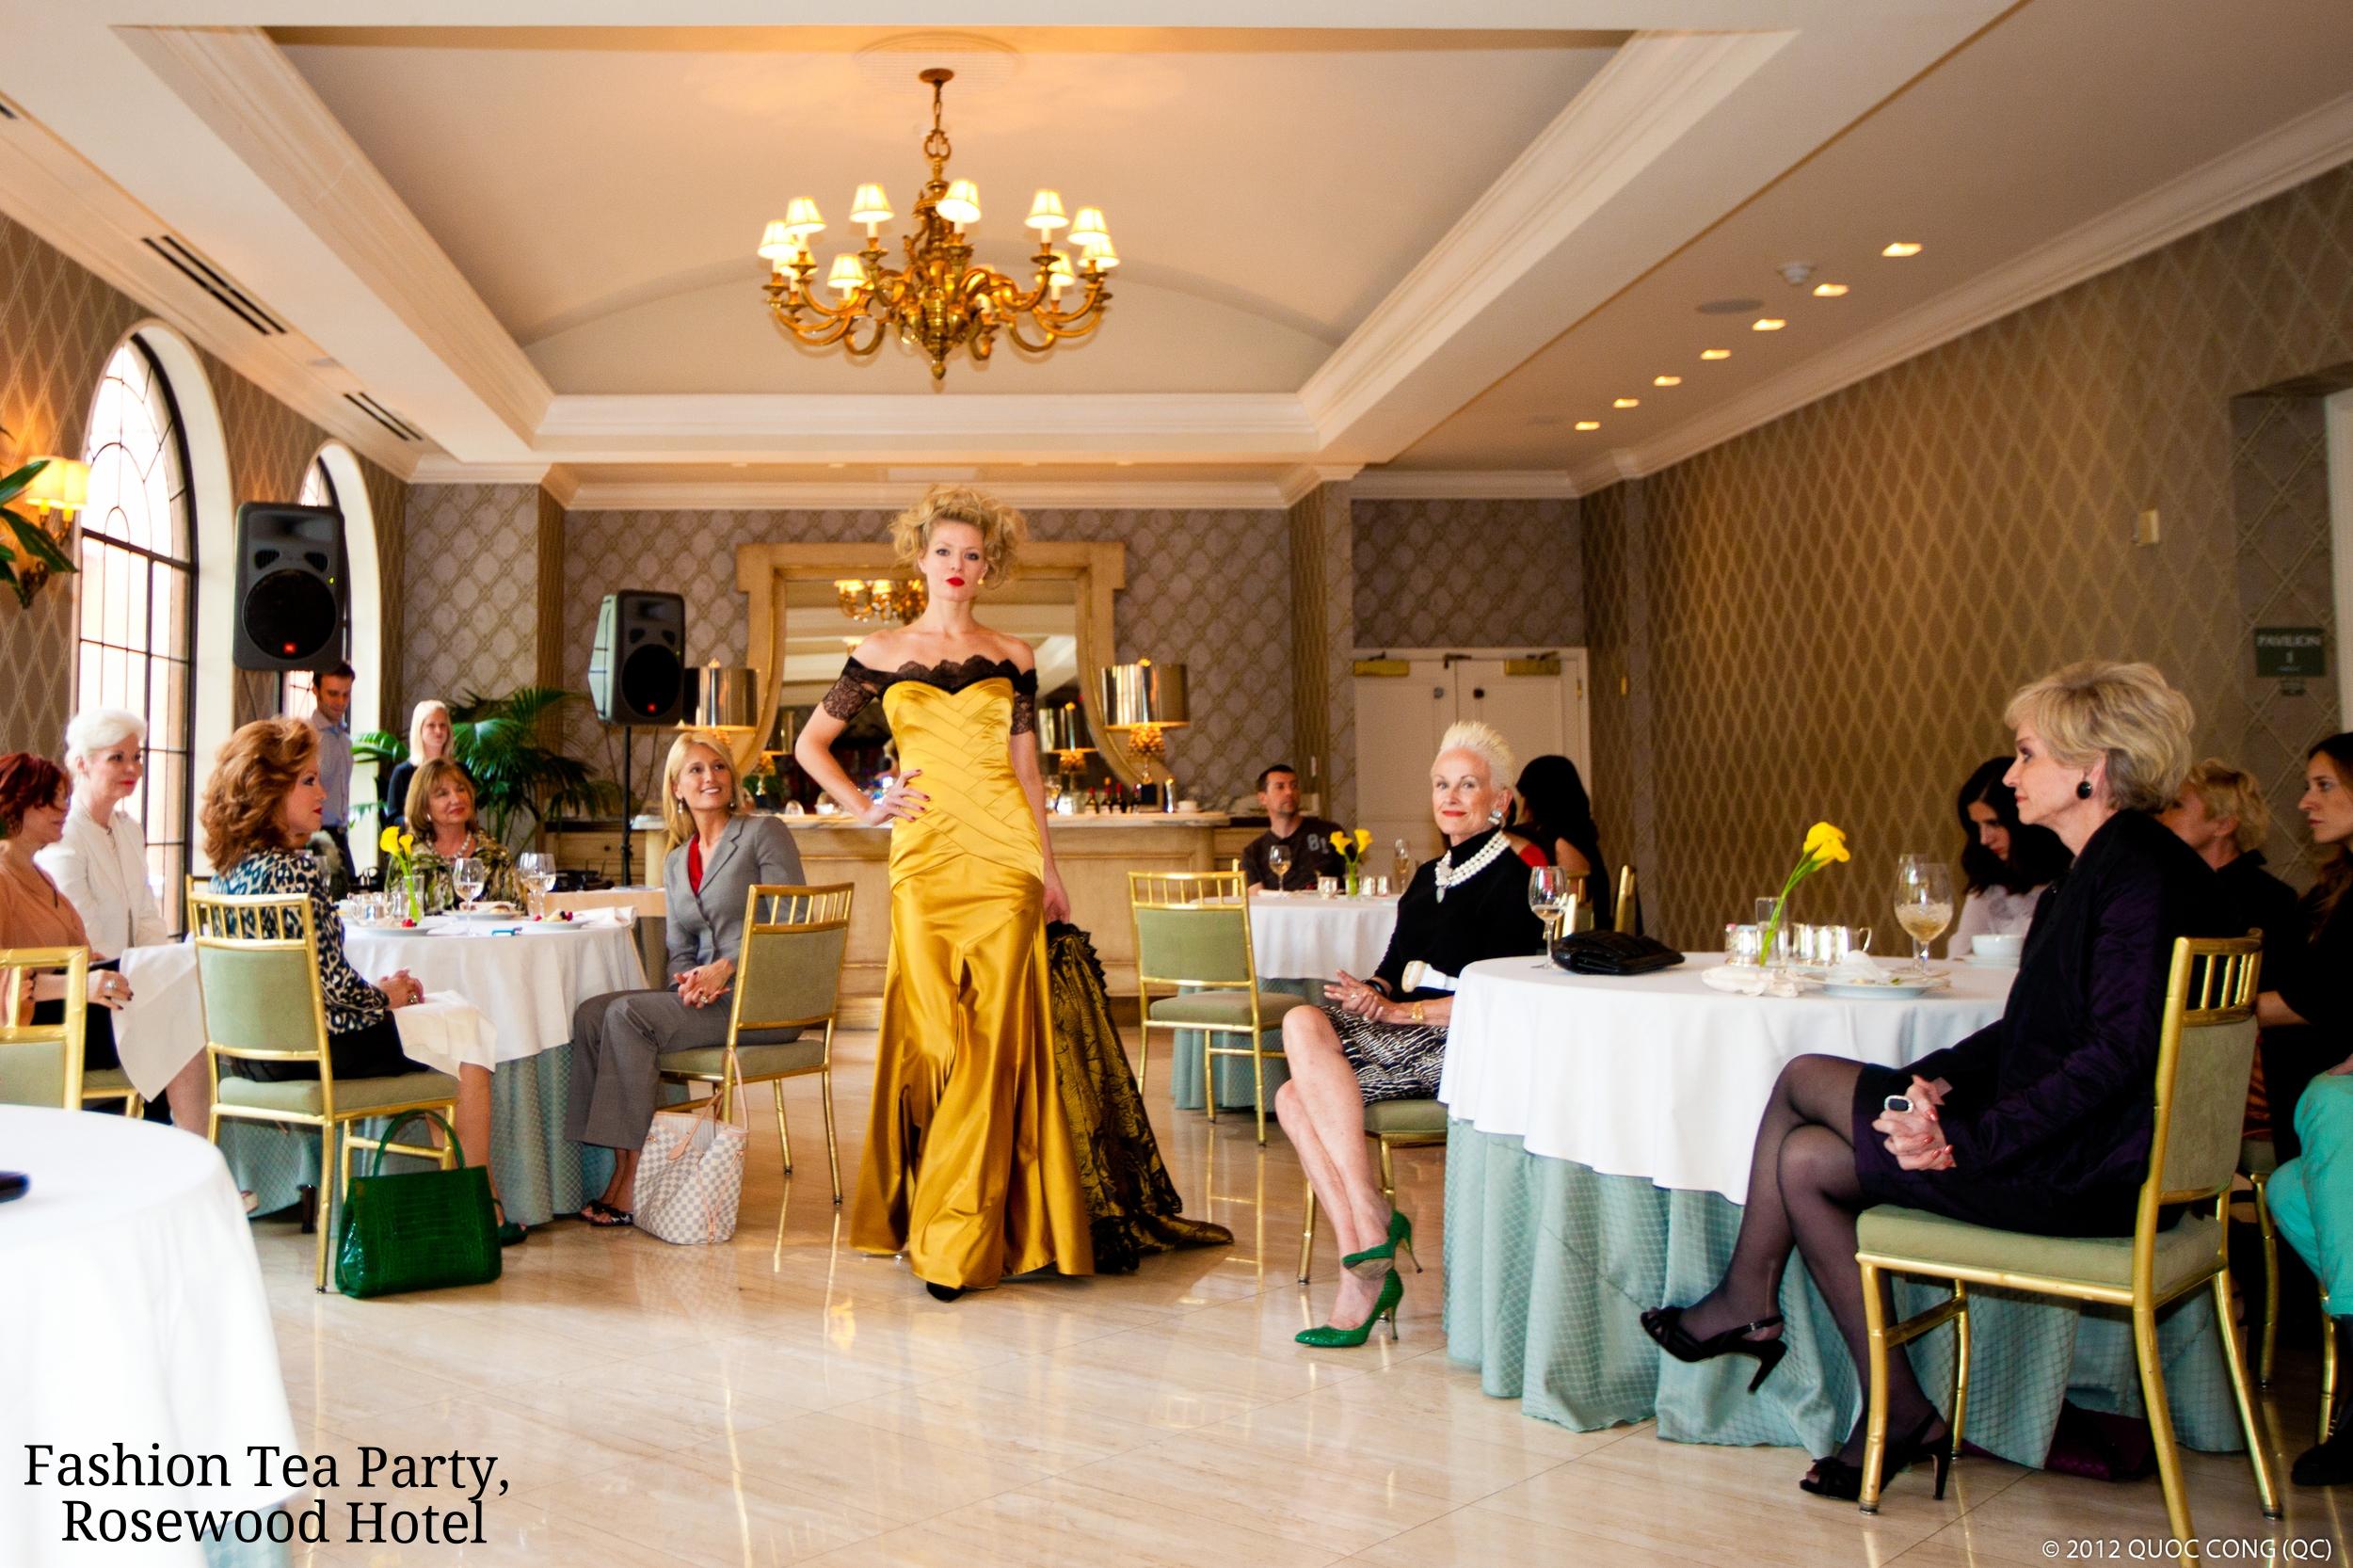 RosewoodHotel_FashionTeaParty5.JPG